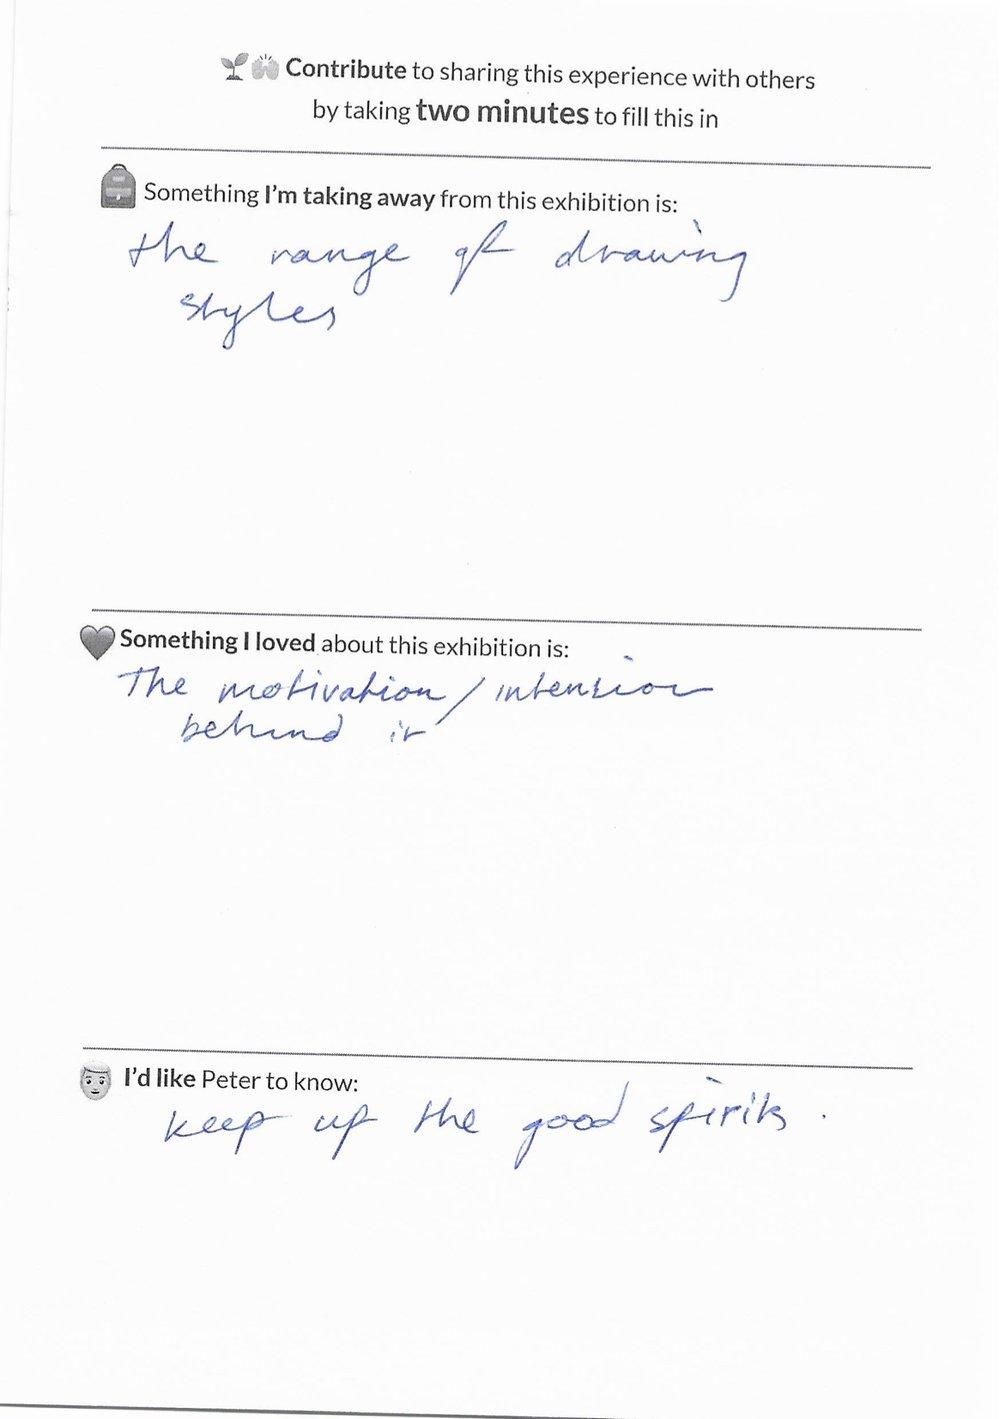 Drawn-in reflections-168.jpg